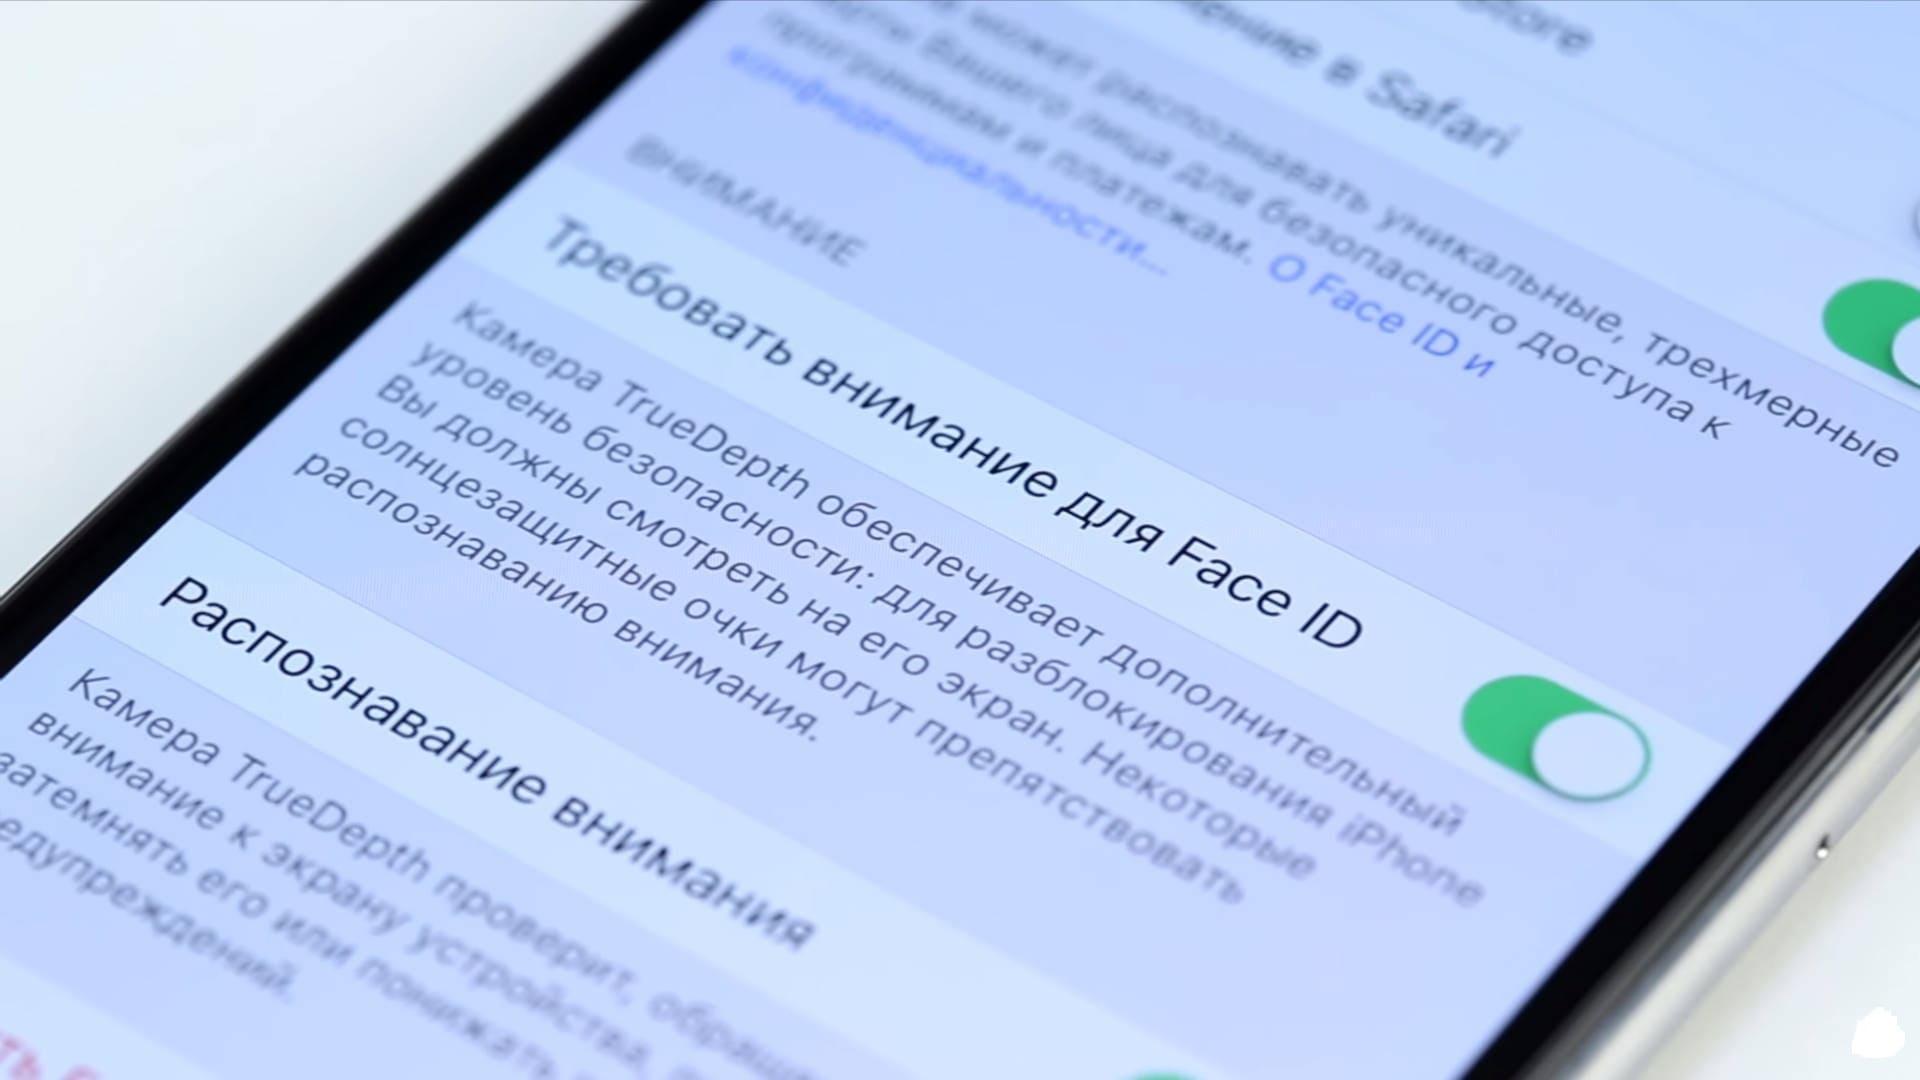 шрифты в iOS